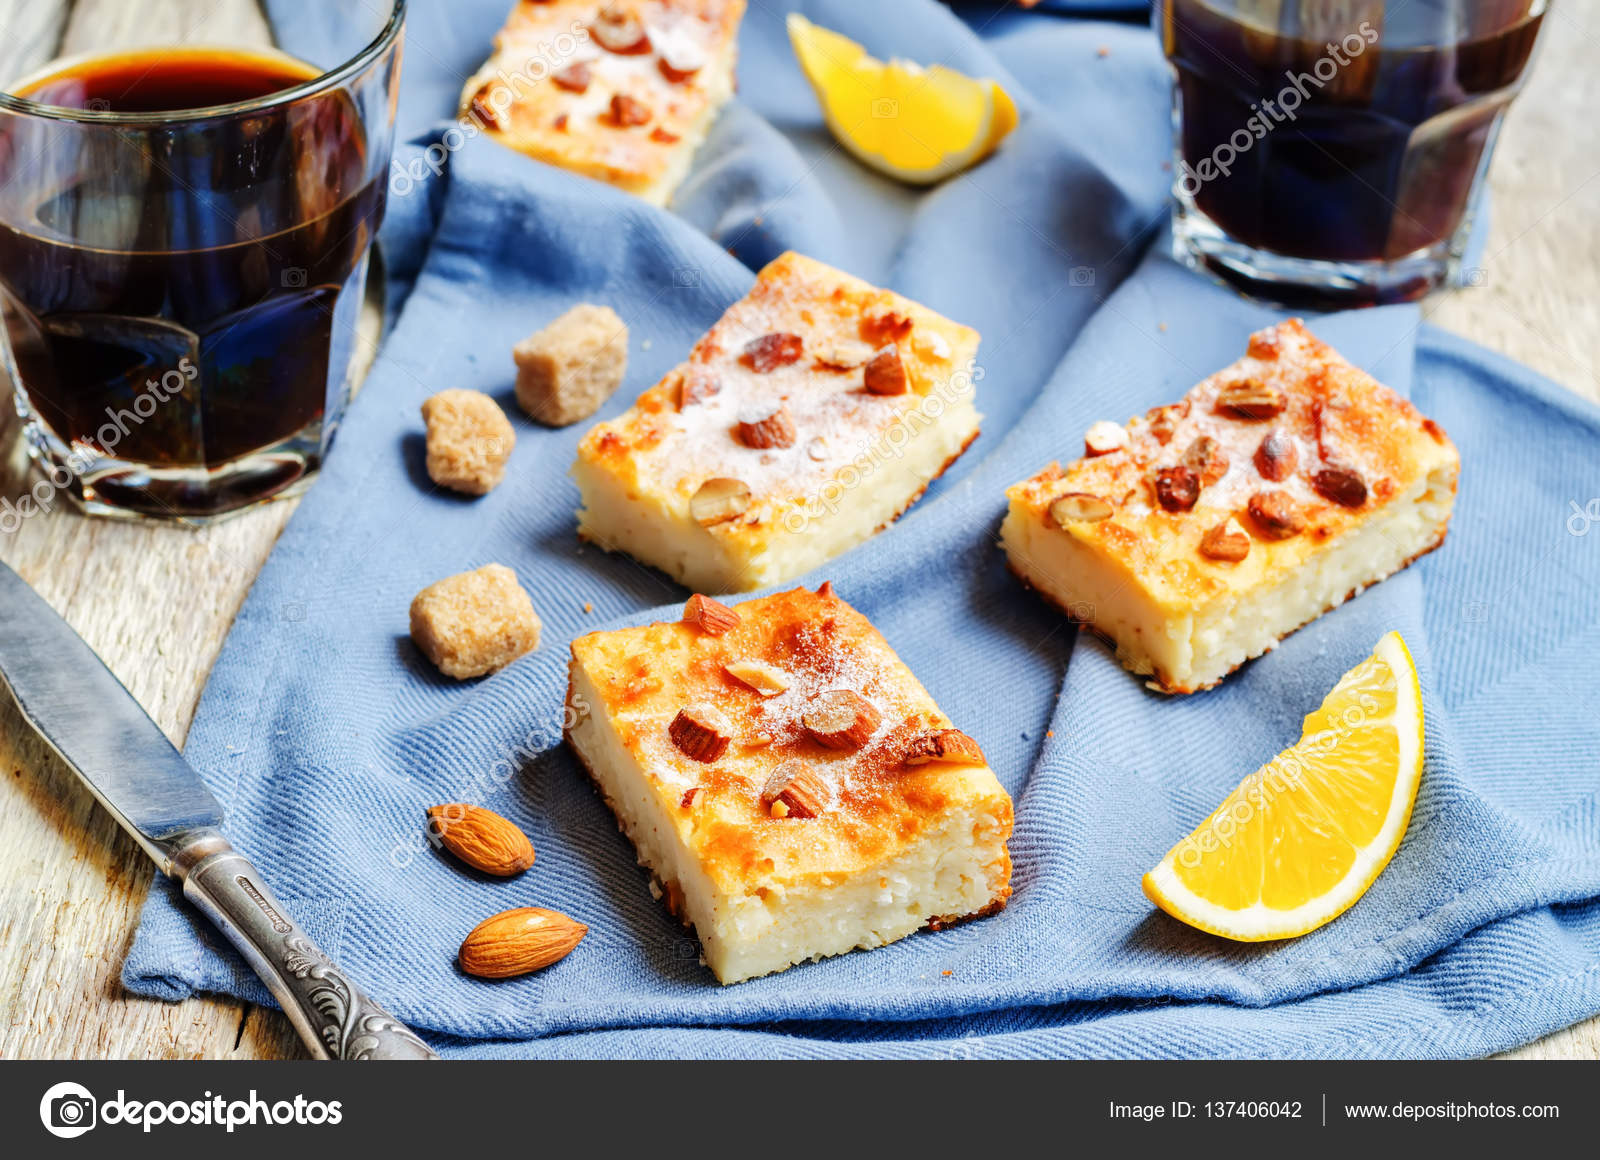 Zitronen Ricotta Kuchen Mit Mandeln Bestreuen Stockfoto